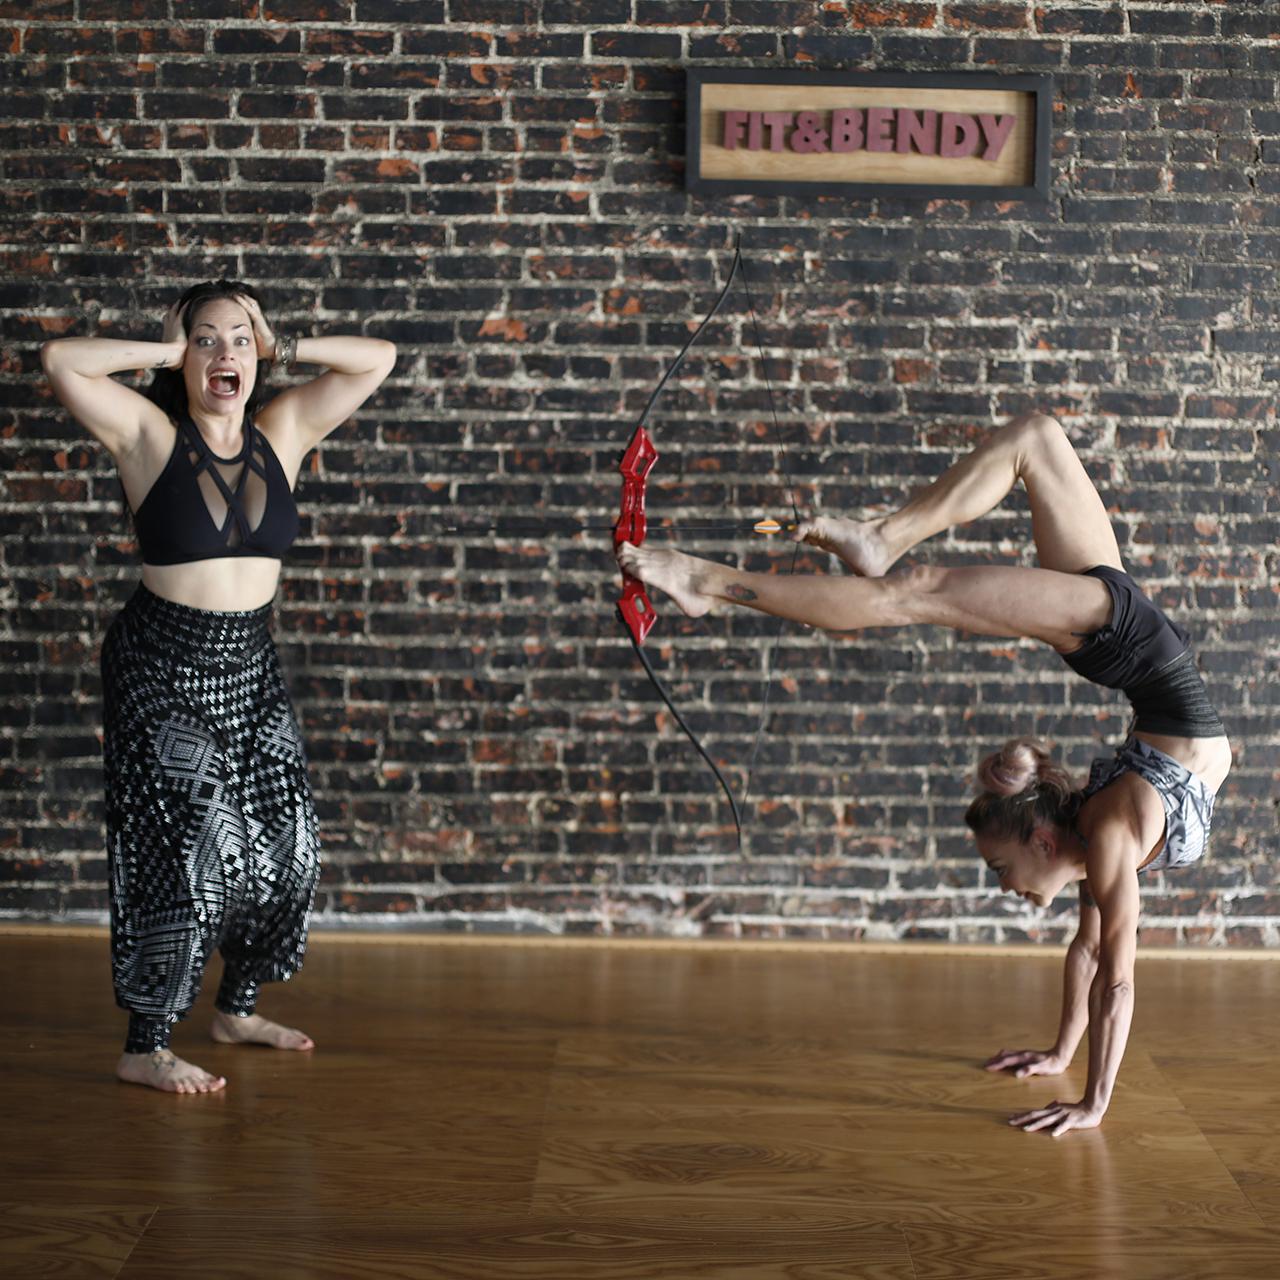 Kristina-Nekyia-Bow-Arrow-Contortion-Fit-and-Bendy-Studio